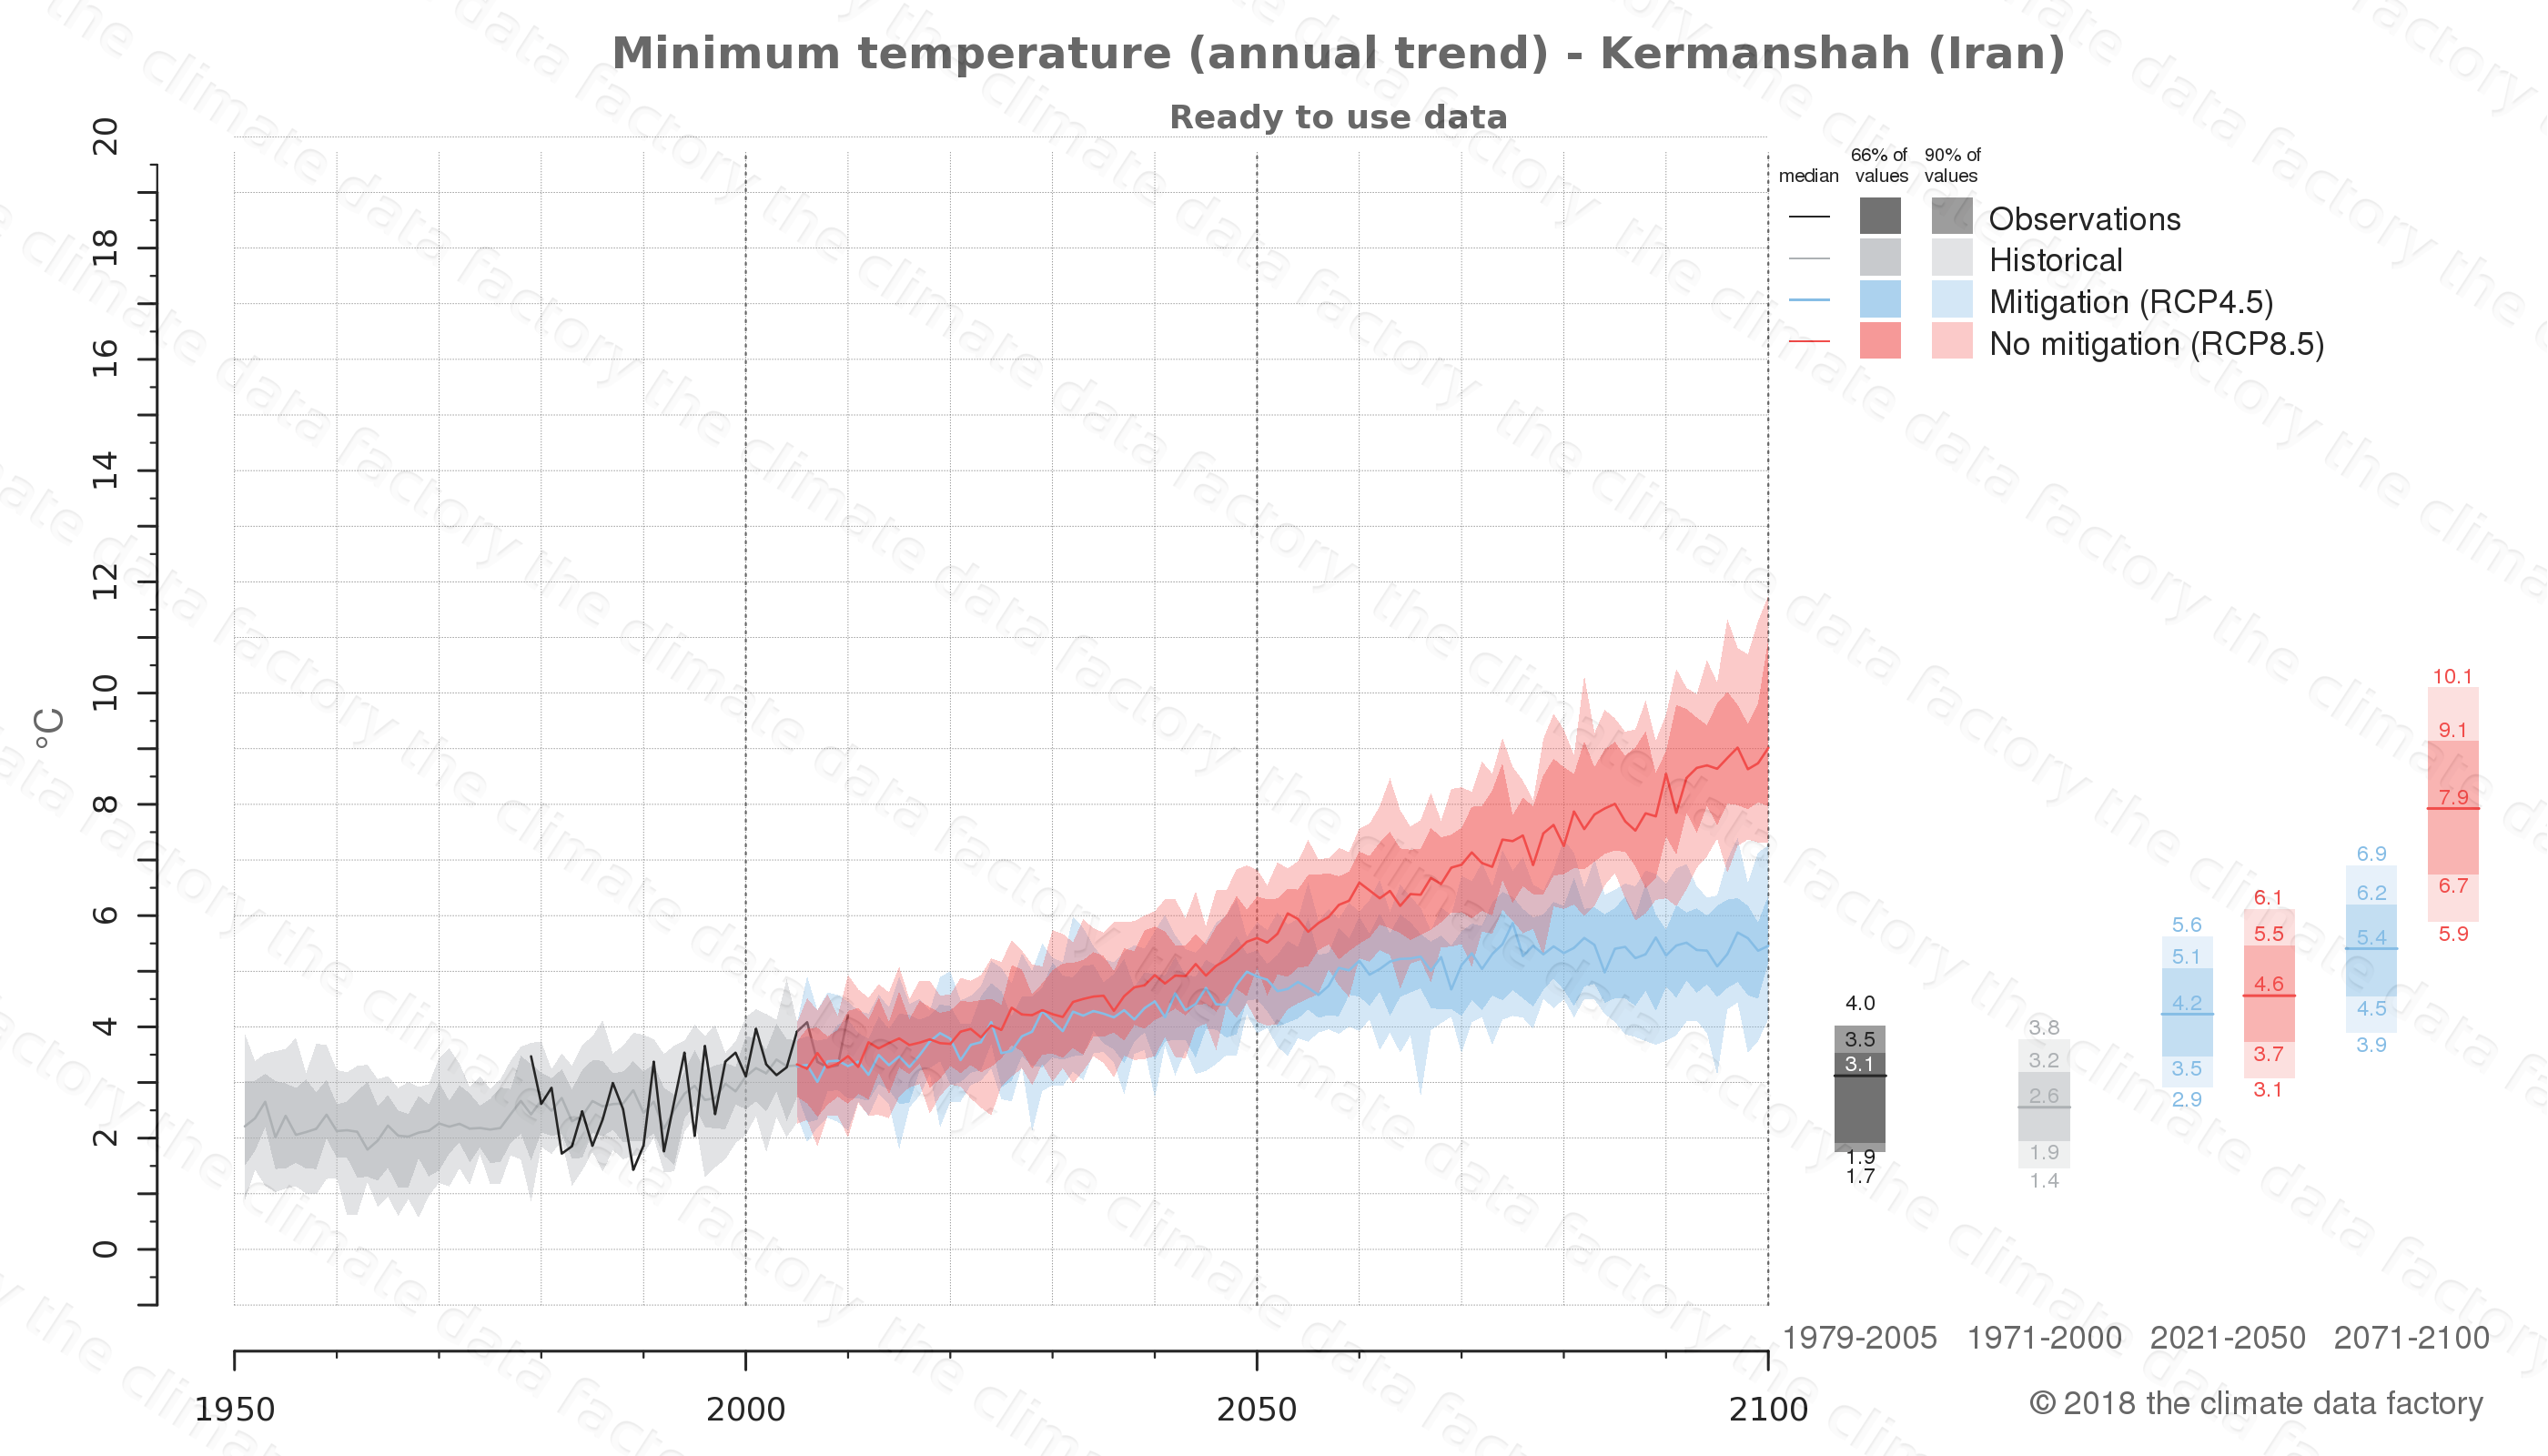 climate change data policy adaptation climate graph city data minimum-temperature kermanshah iran